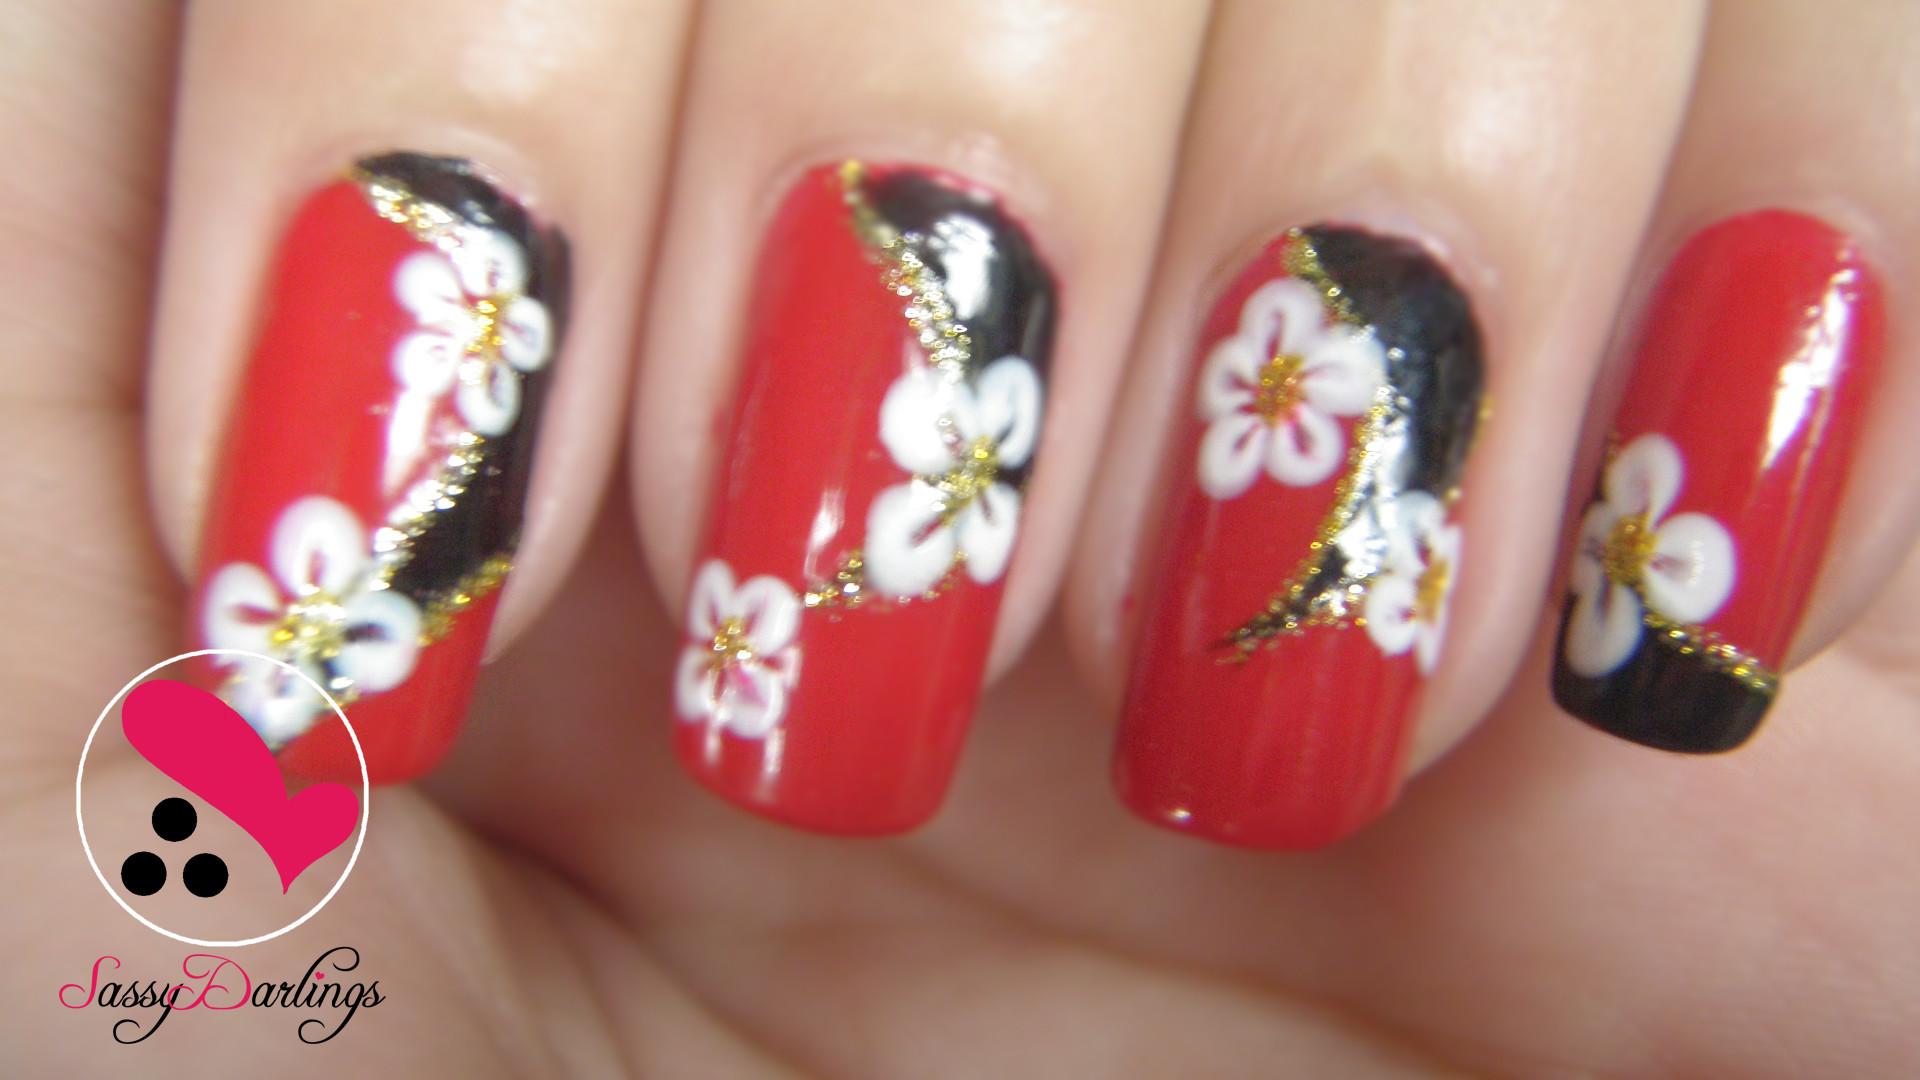 Nails Wallpaper 58 Images